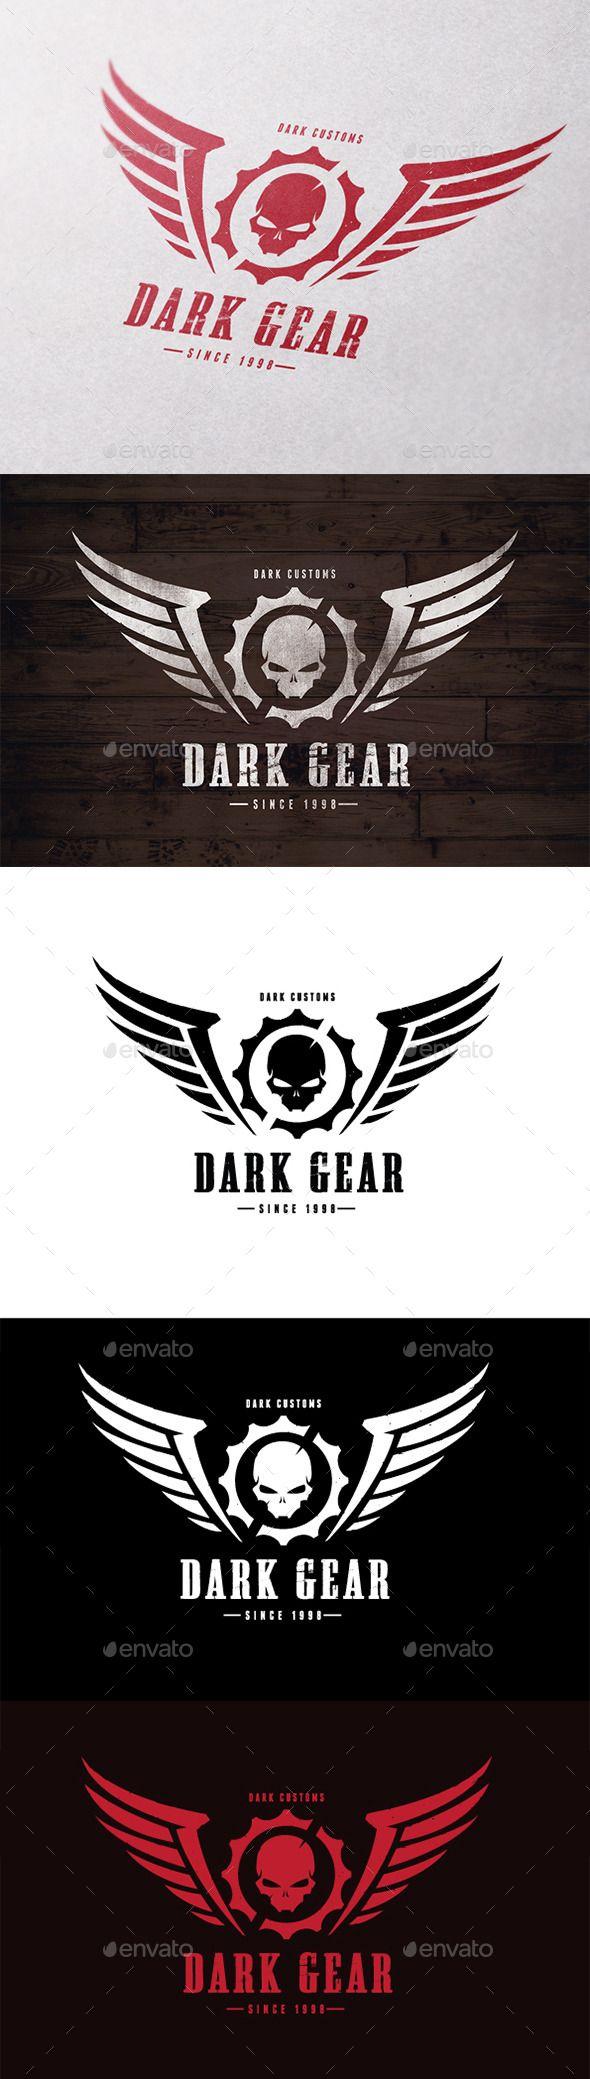 Dark Gear Logo Template #design #logotype Download: http://graphicriver.net/item/dark-gear/10609954?ref=ksioks